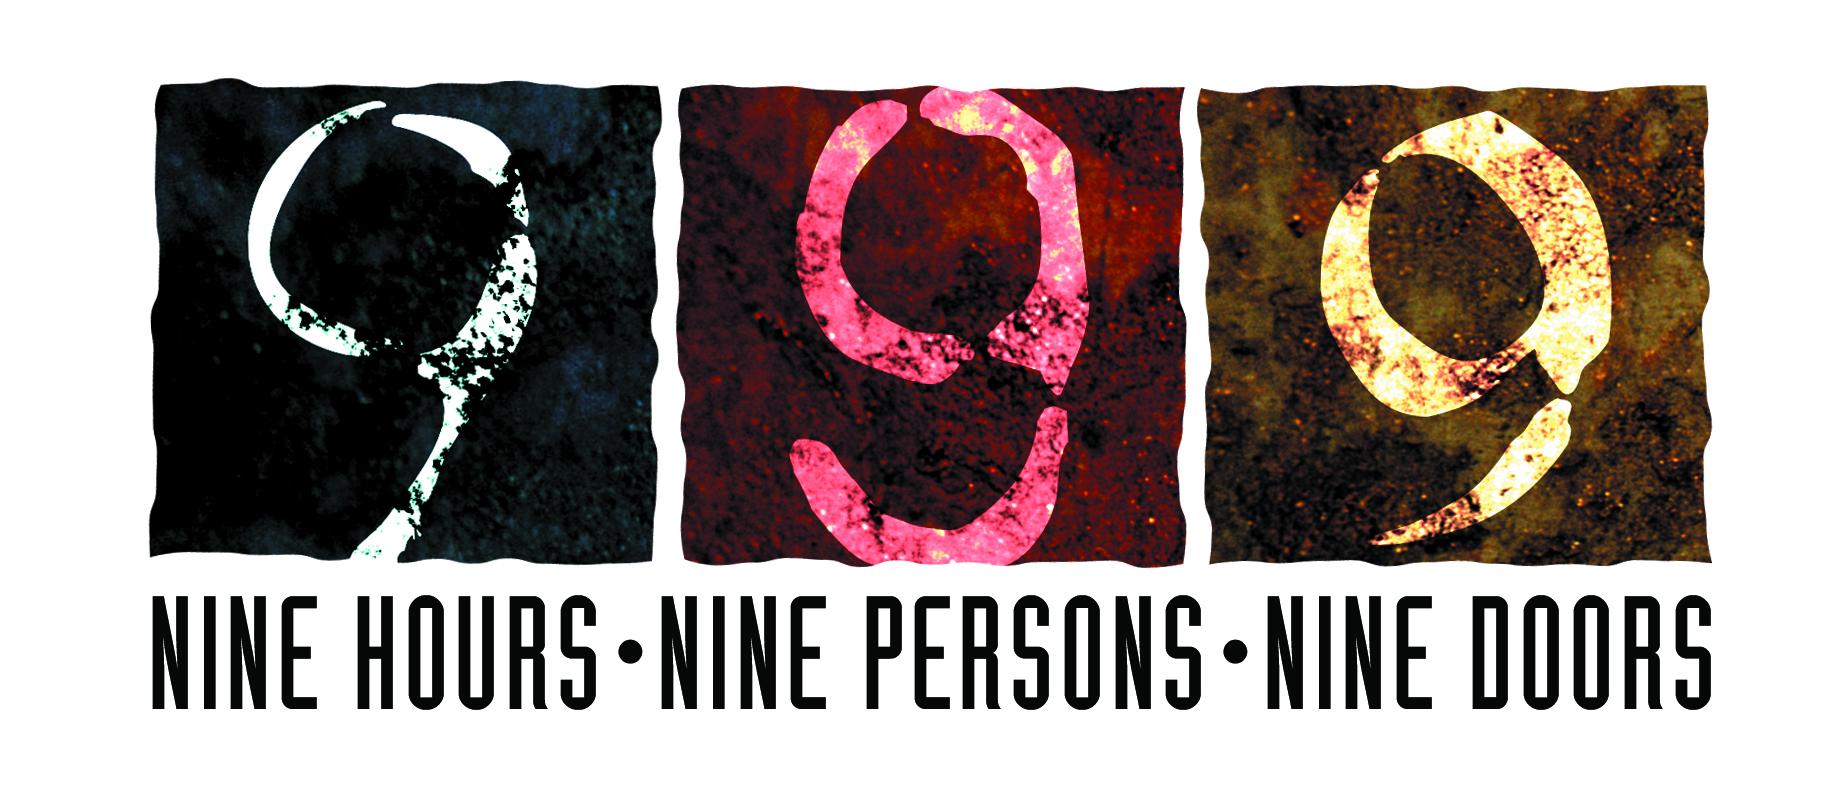 You ...  sc 1 st  Moar Powah! & Laevatein\u0027s Readin\u0027 Sessions: Nine Hours Nine Persons Nine Doors ...